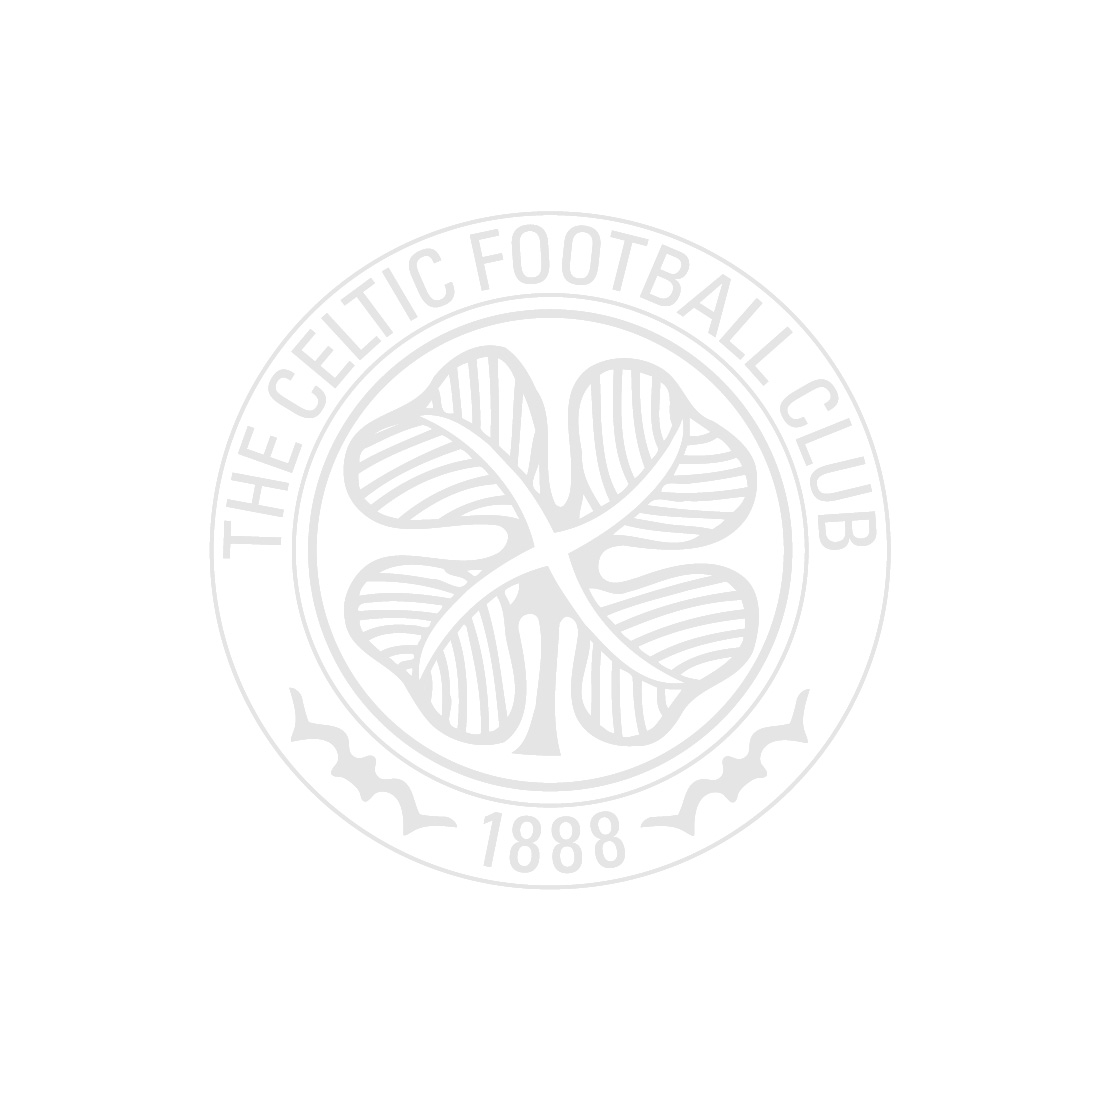 Retro Cassette Celtic T-shirt